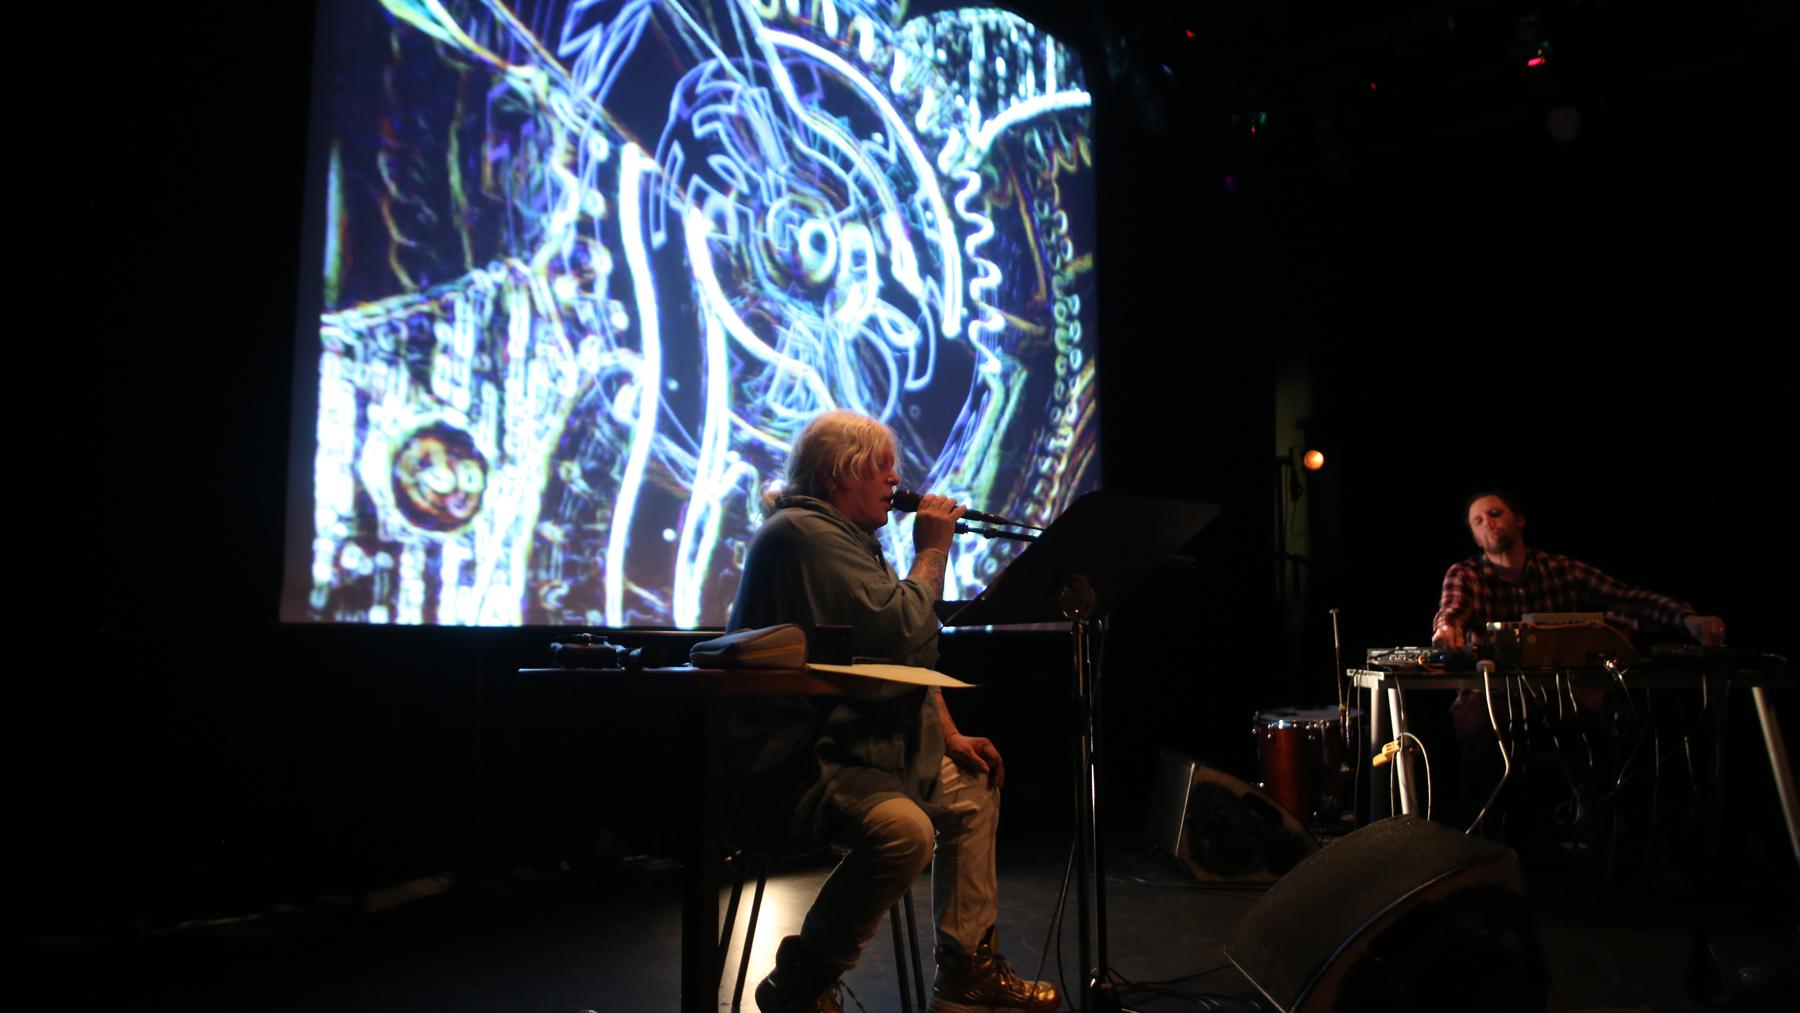 genesis p-orridge live jazzhouse copenhagen